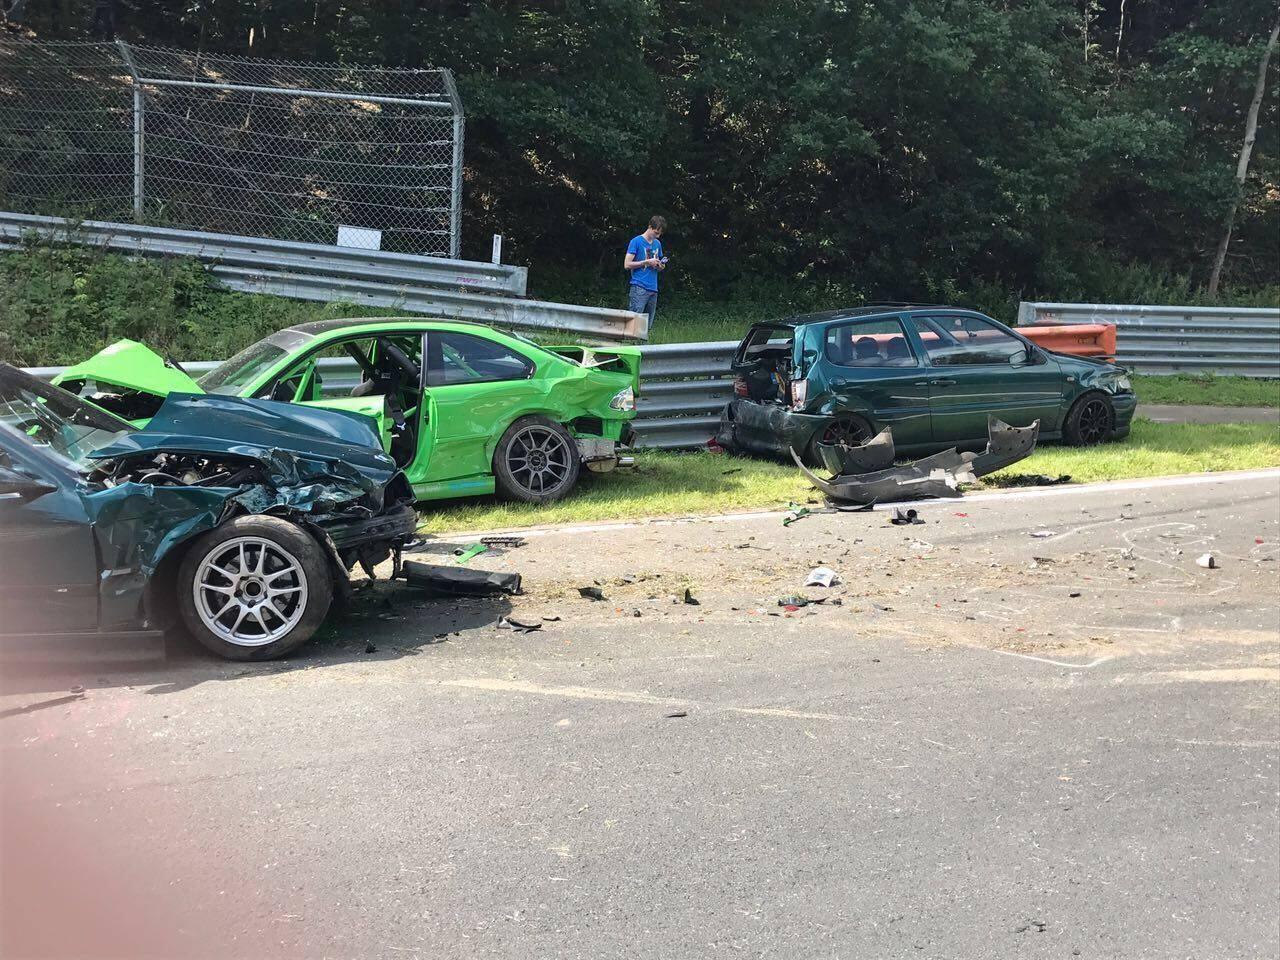 Nurburgring crash august 2017 (5)